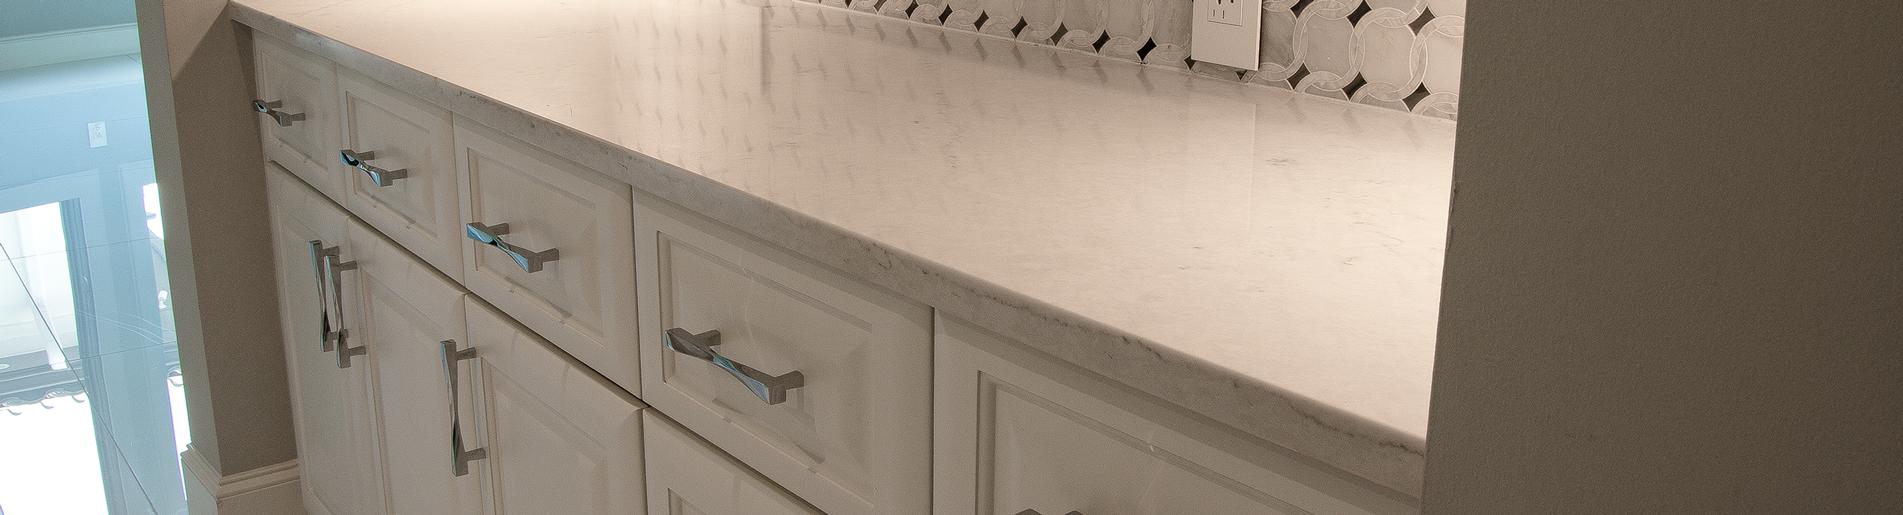 19-sta-granite-bathroom-cambria-c